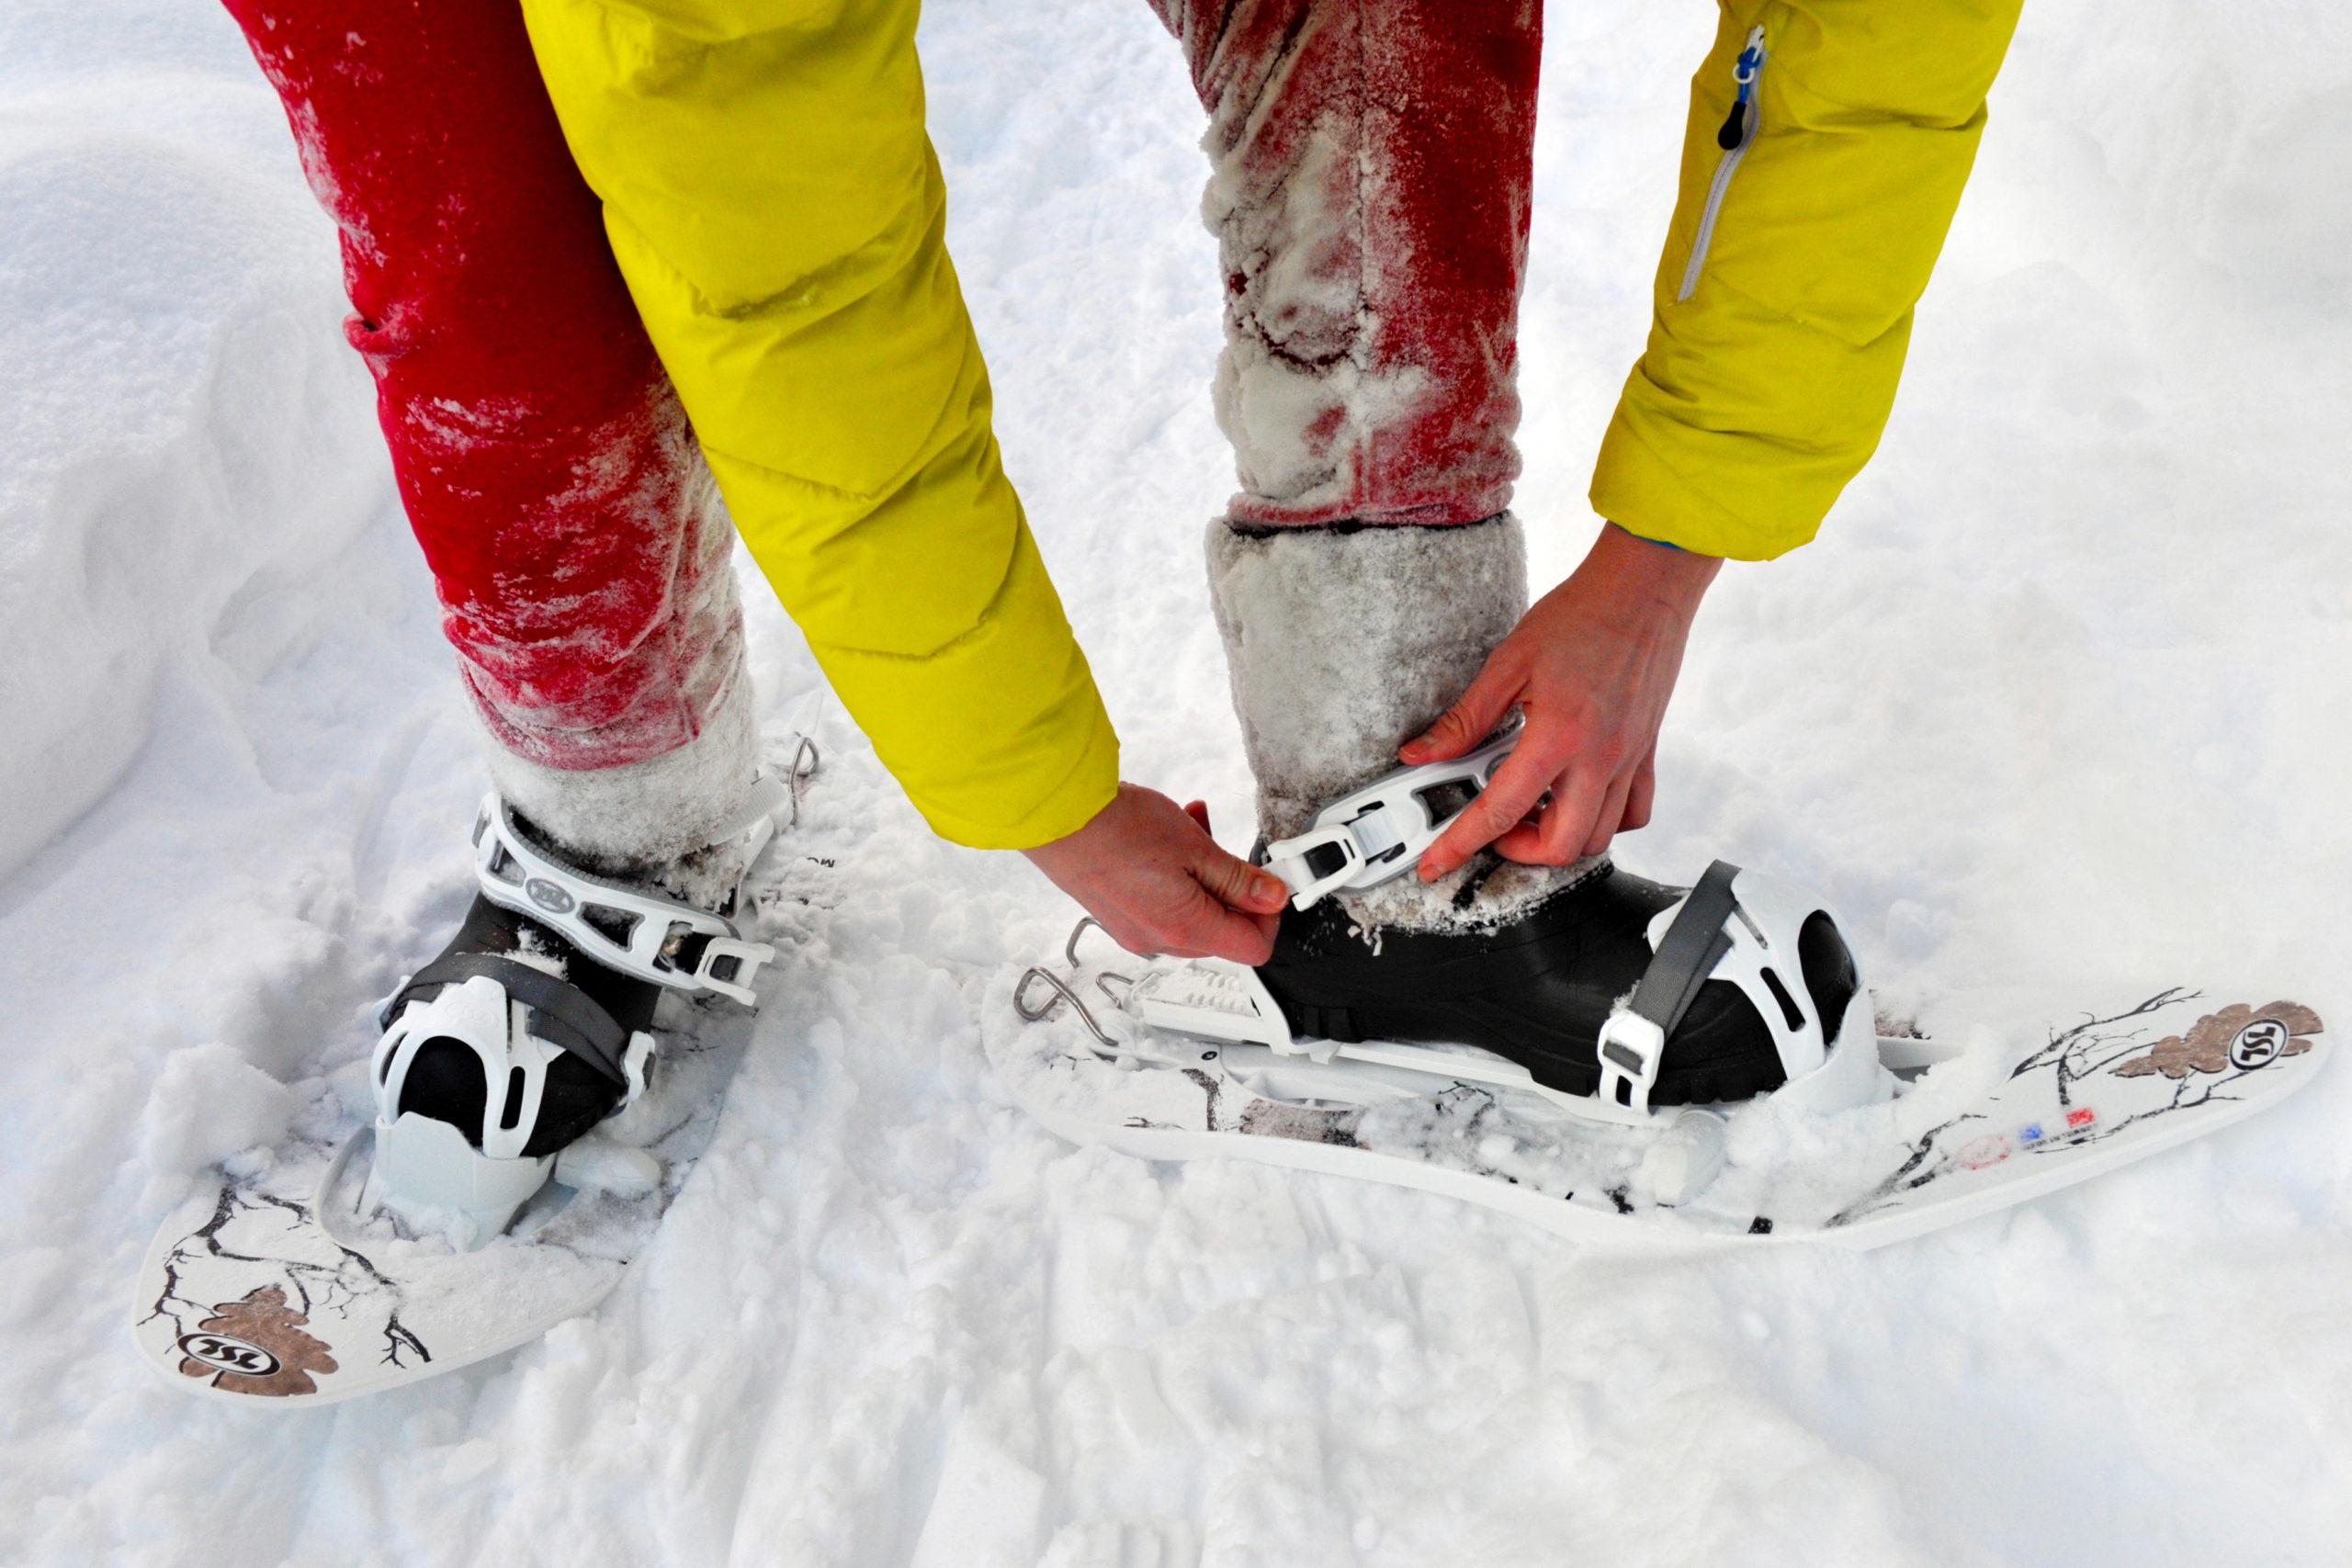 tourist puts on snowshoes